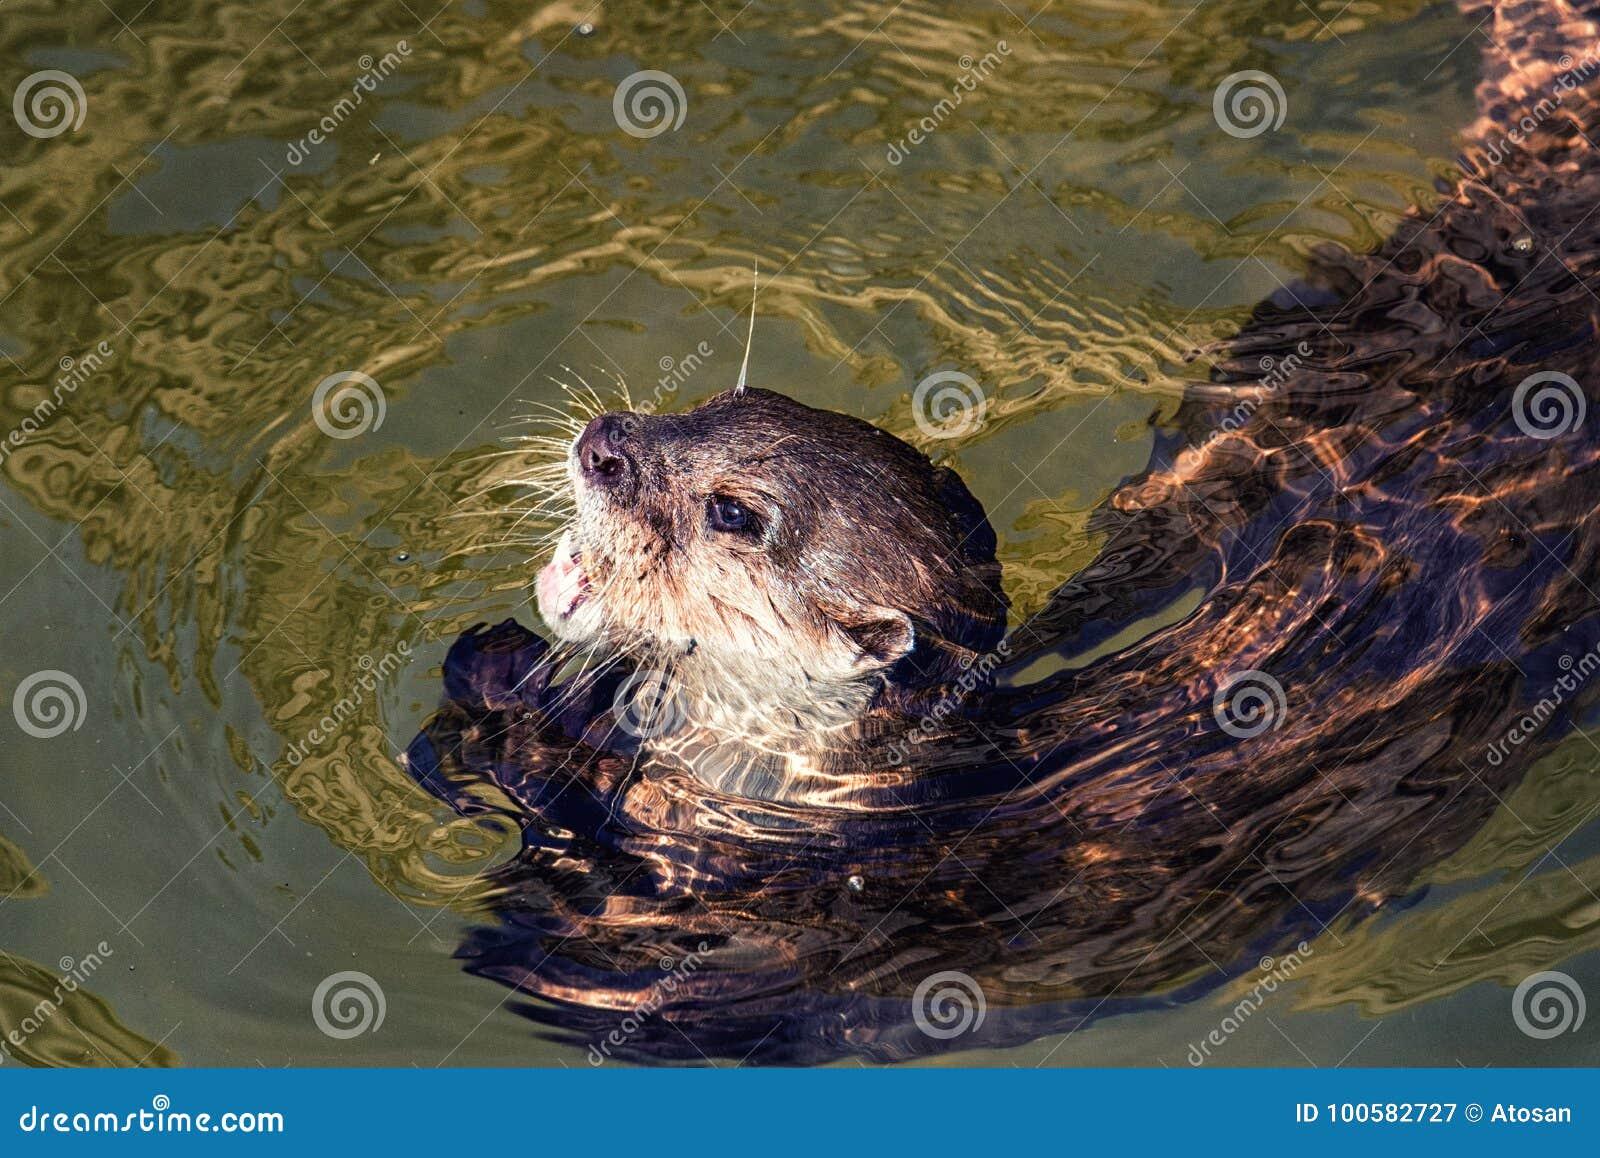 6e24ab54f Swimming otter stock image. Image of mammal, photography - 100582727